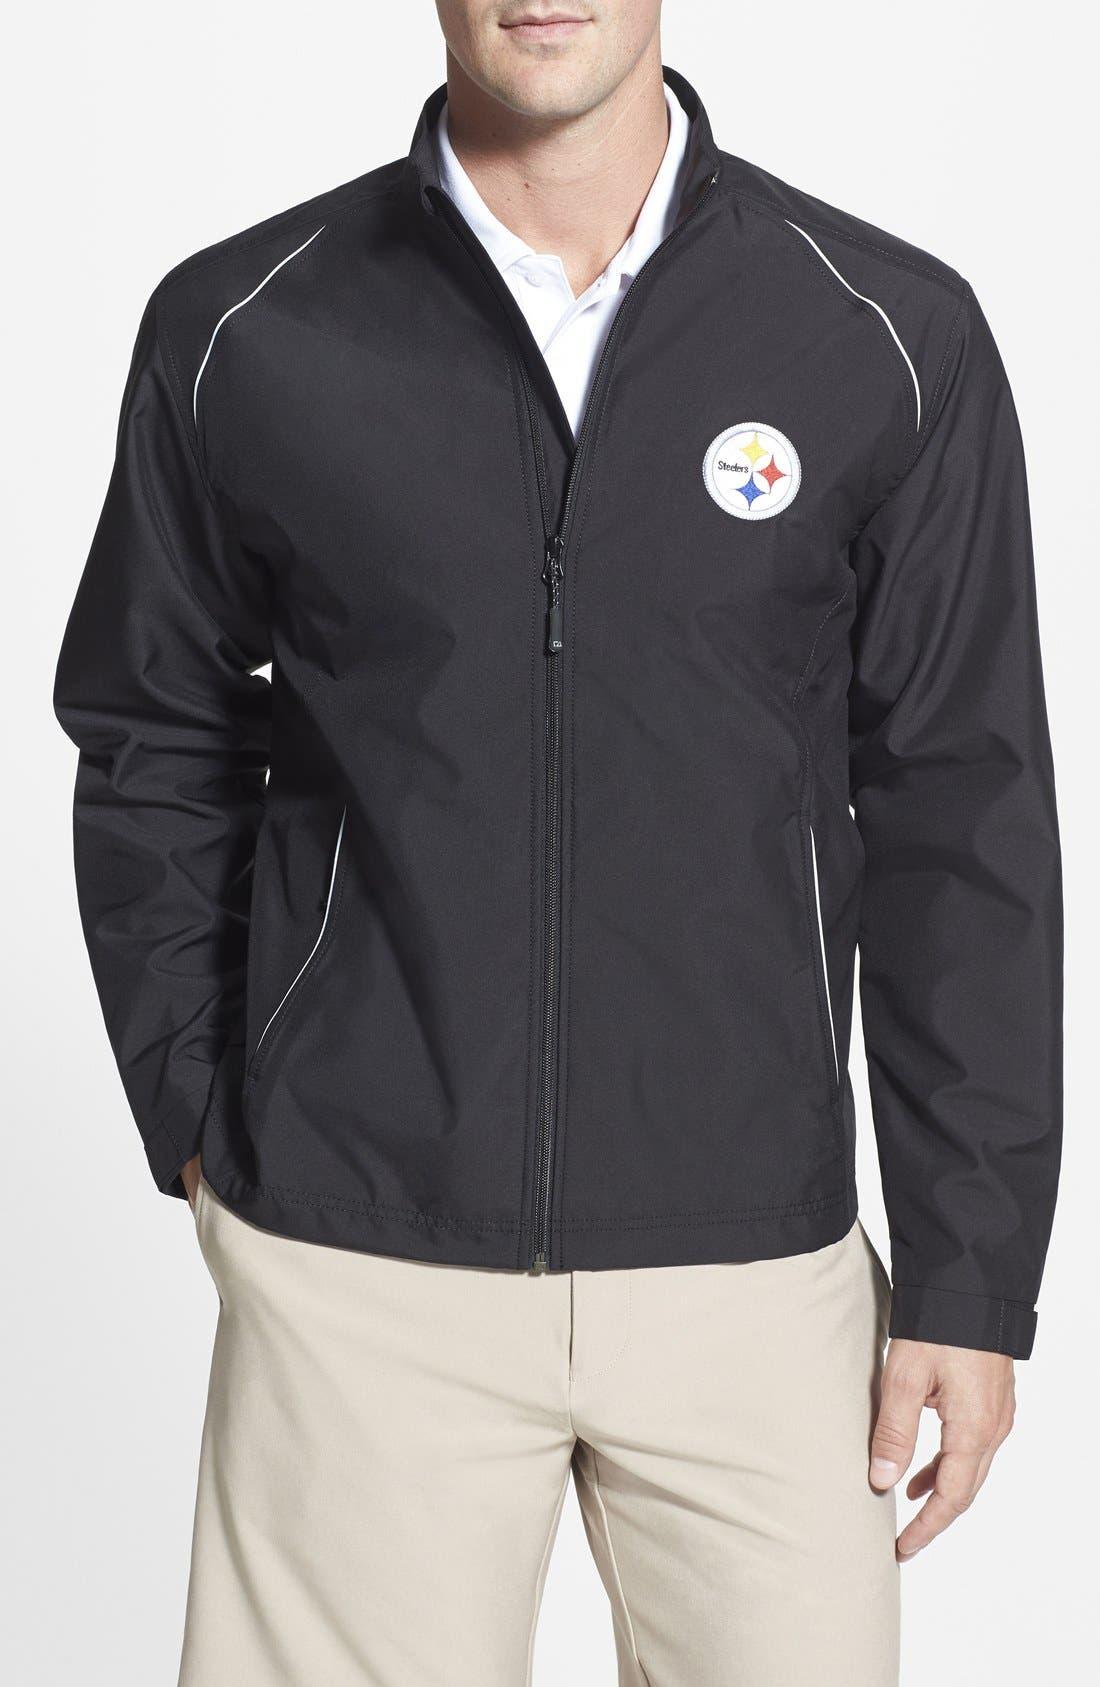 Cutter & Buck Pittsburgh Steelers - Beacon WeatherTec Wind & Water Resistant Jacket